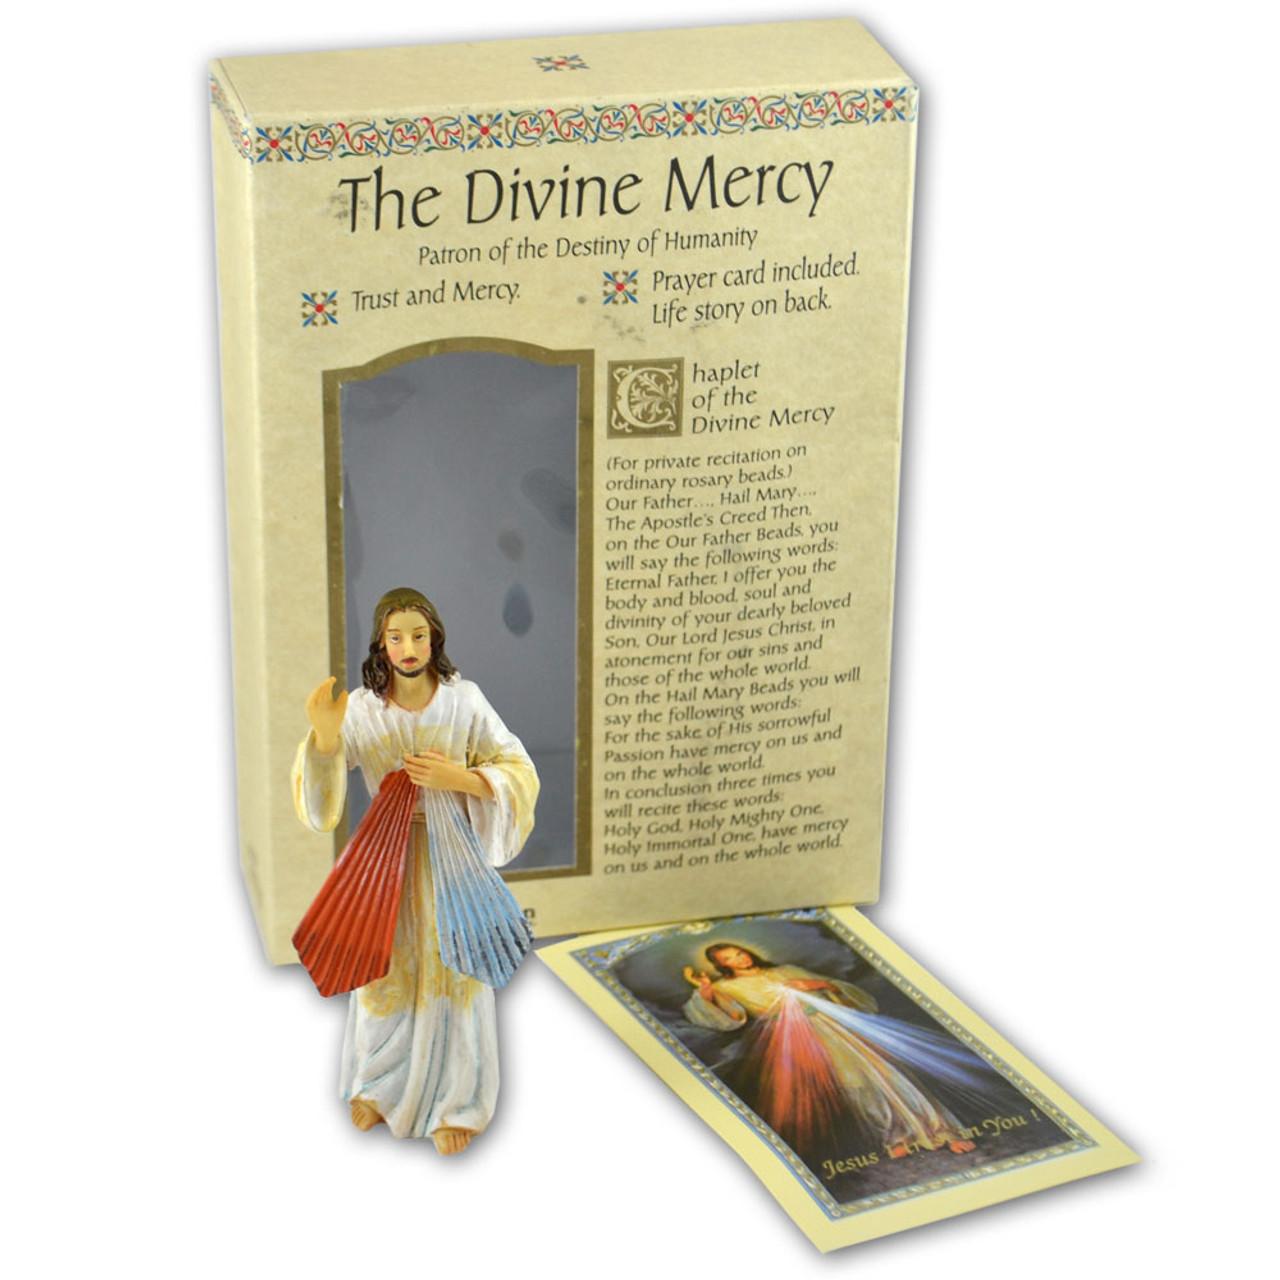 Divine Mercy Jesus I Trust in You 4 Inch Statue